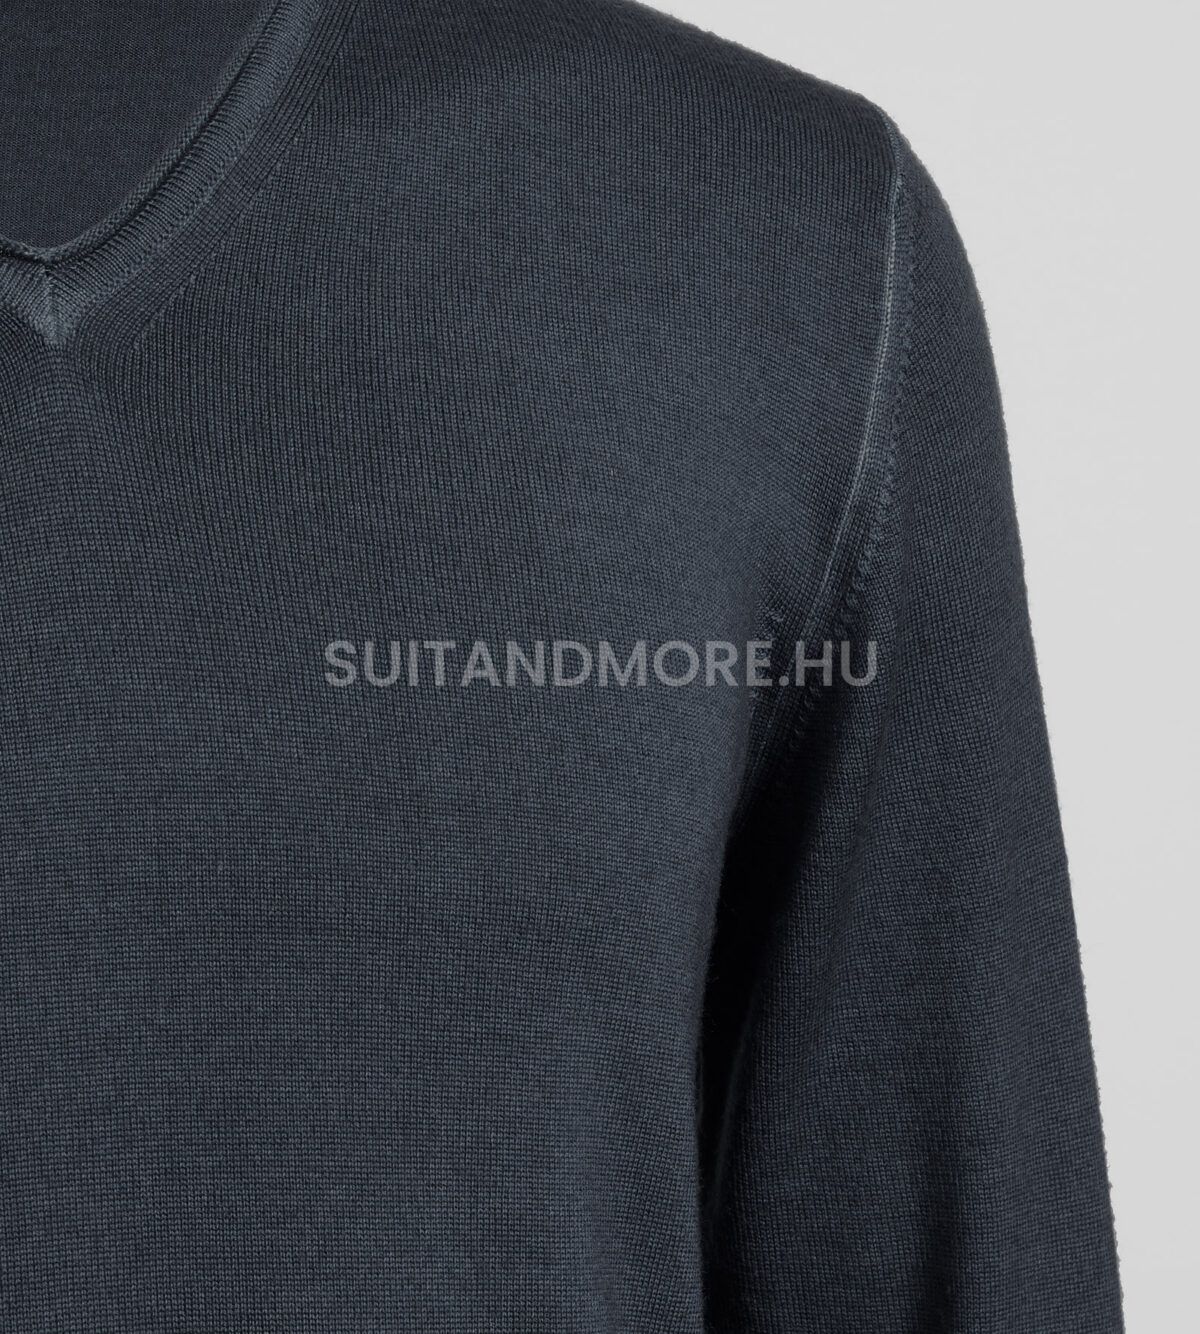 digel-sotetszurke-modern-fit-v-nyaku-gyapju-pulover-fabrizio1-1-1288001-40-02